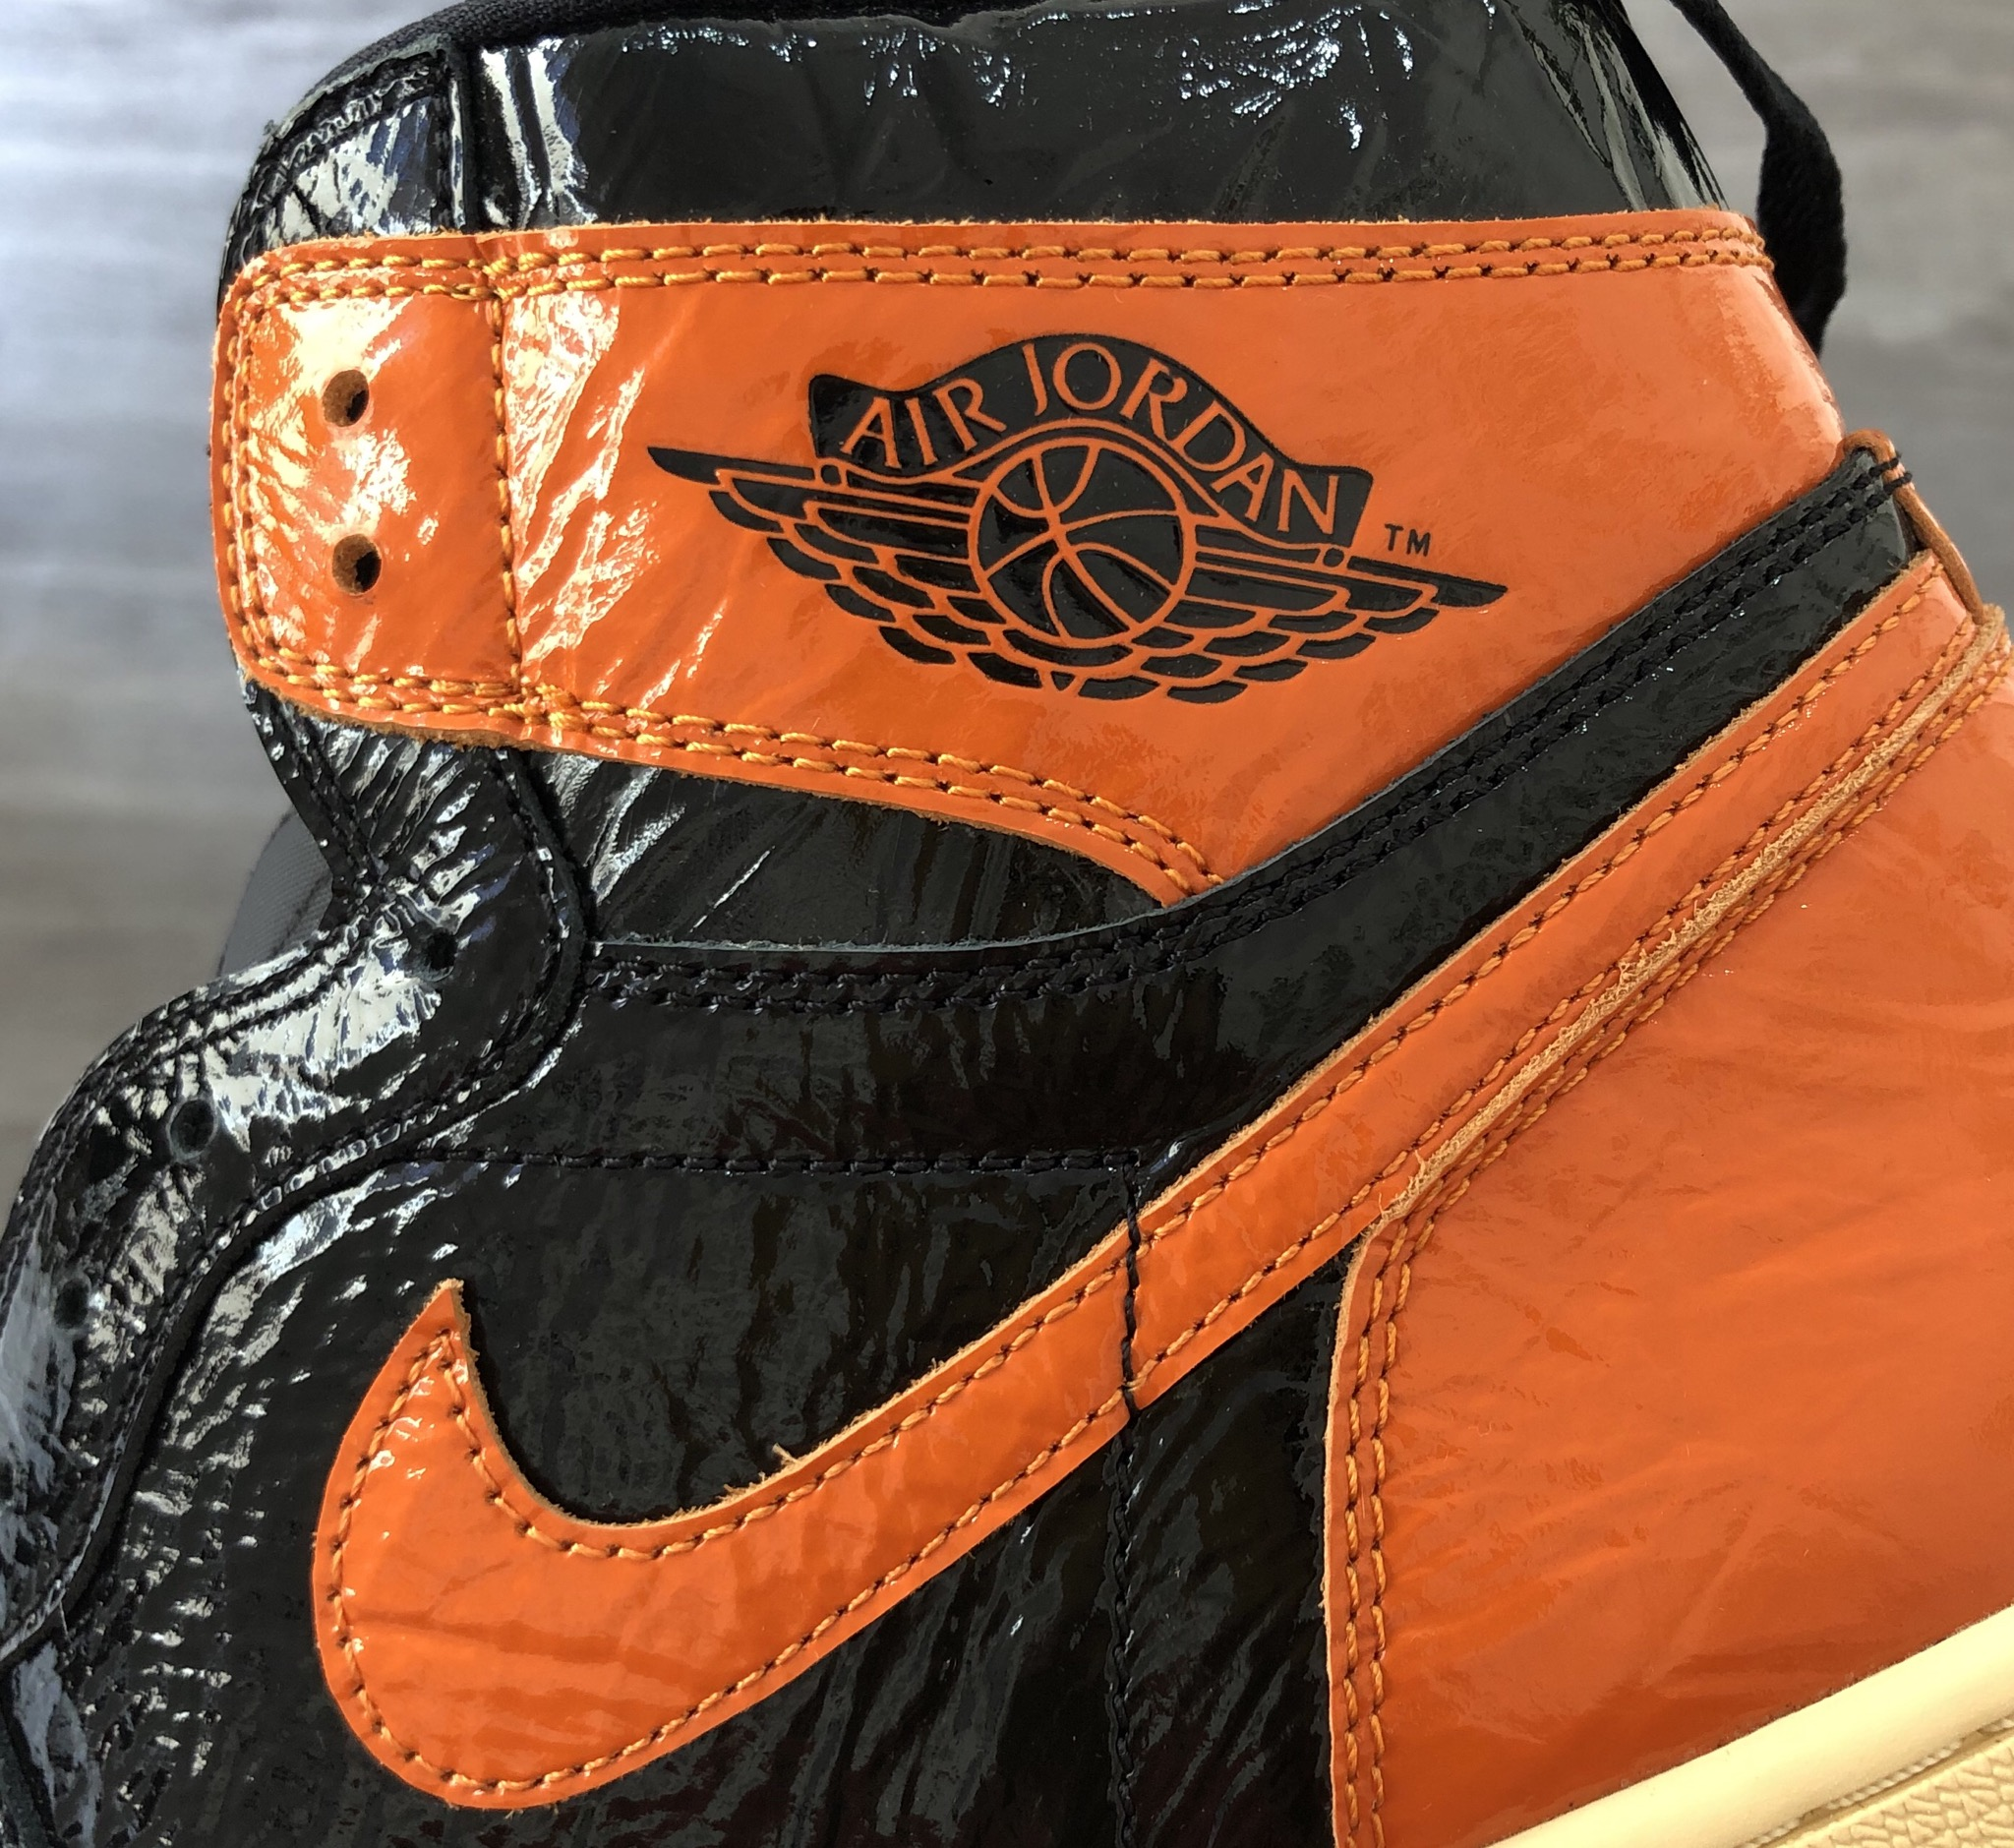 Nike Air Jordan1 Shattered BackBoard 3.0